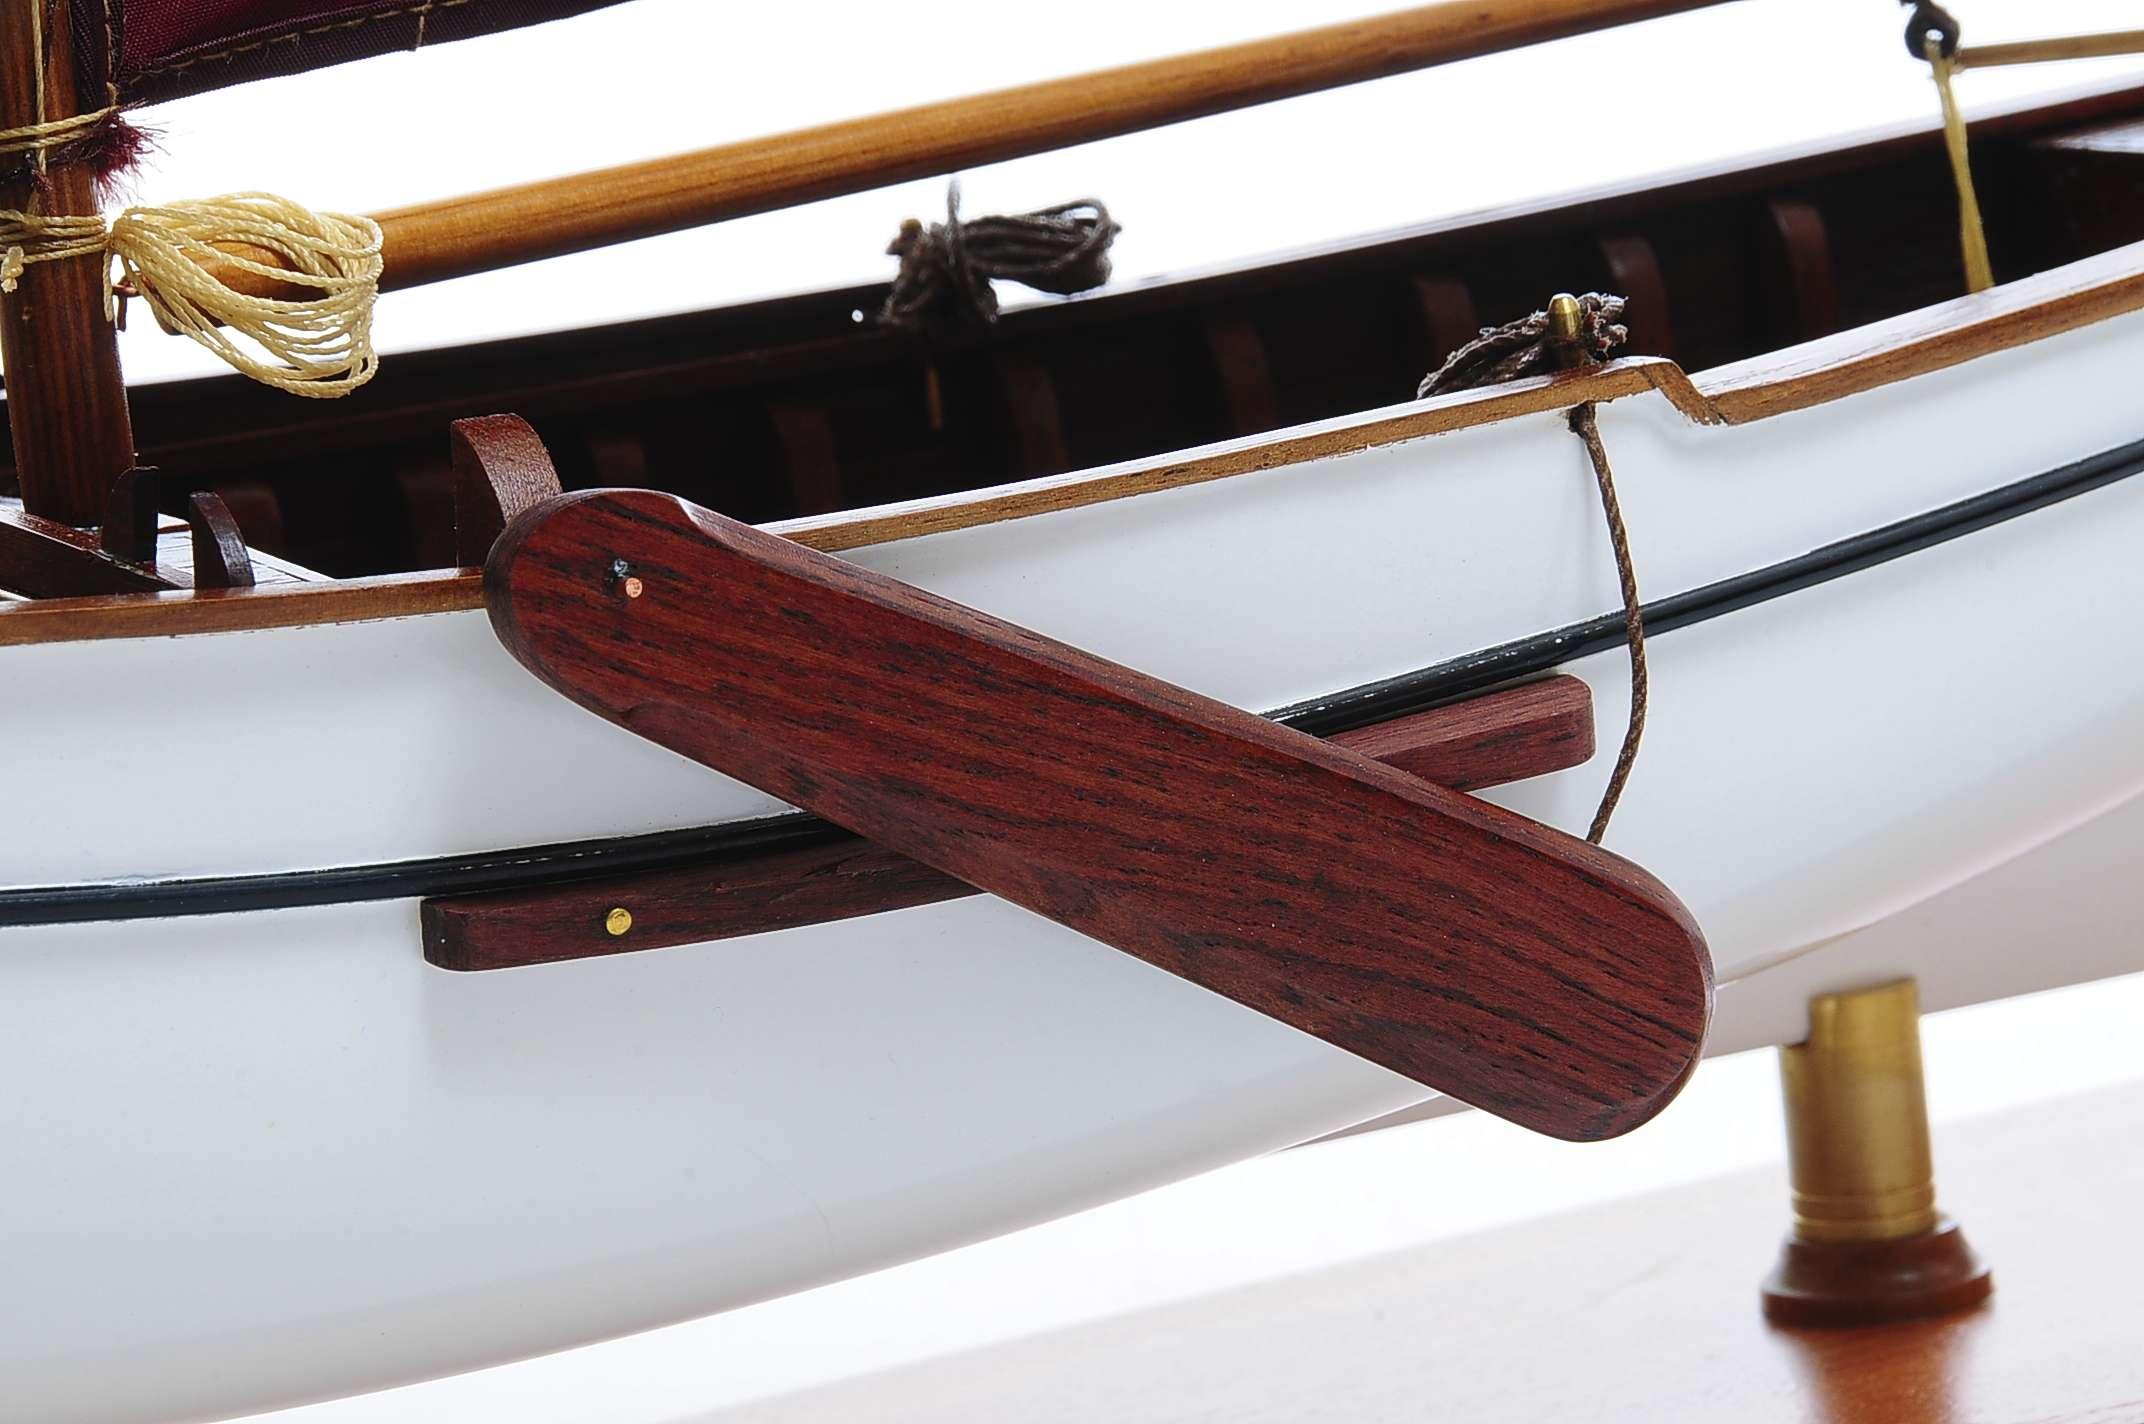 1432-4577-Dutch-Marker-Roundbow-Model-Boat